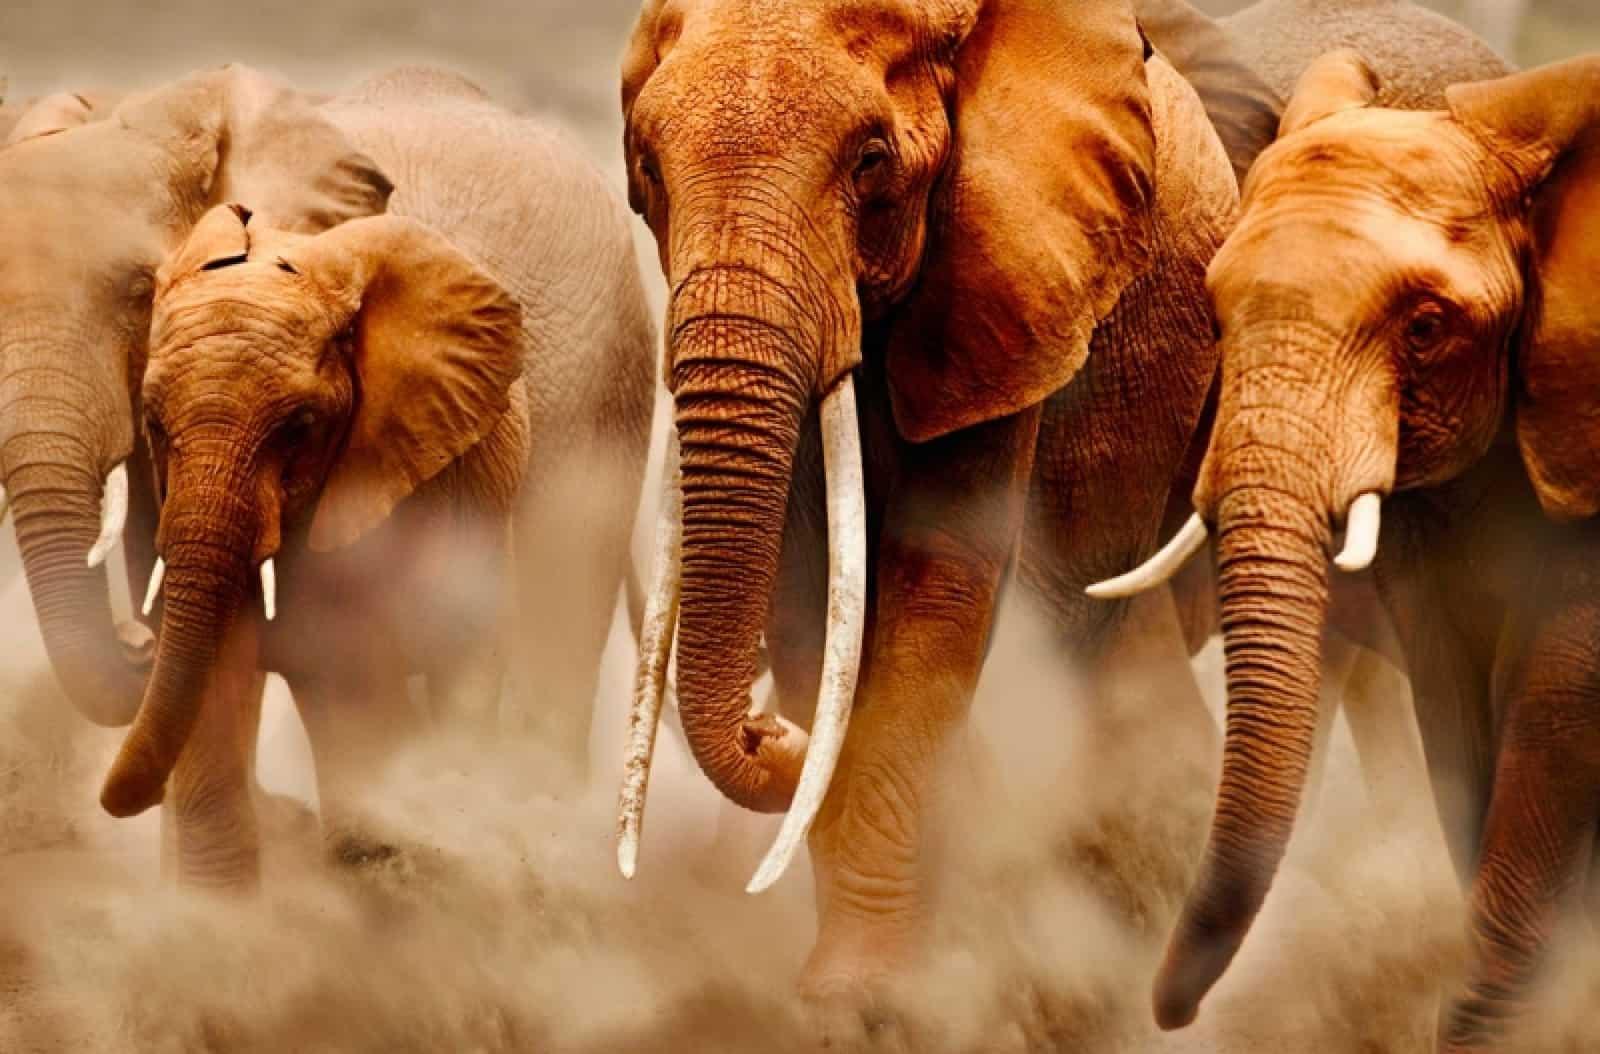 Eine Herde Afrikanischer Elefanten